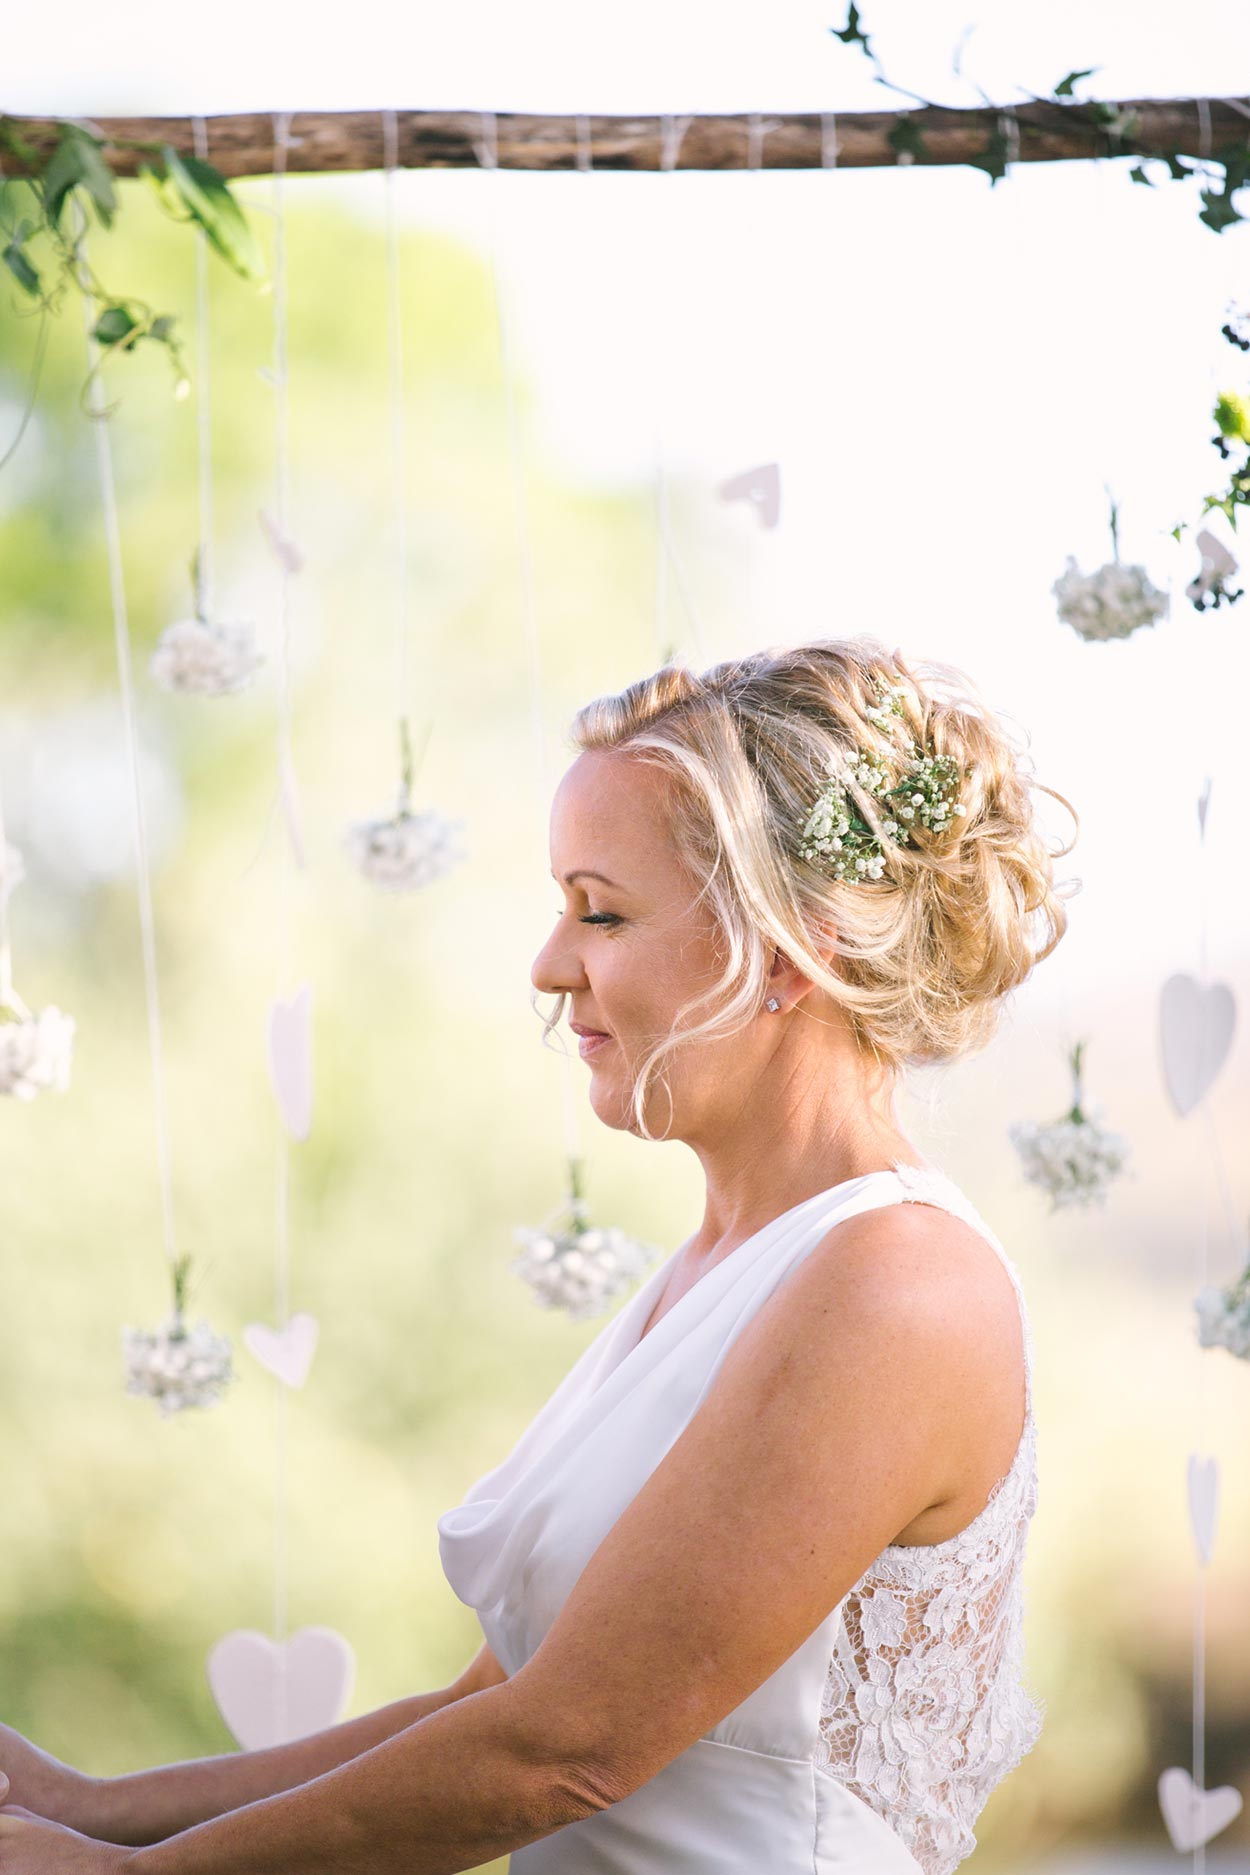 Perfect Moments Captured, Queensland - Caloundra, Sunshine Coast, Australian Wedding Destination Photographers